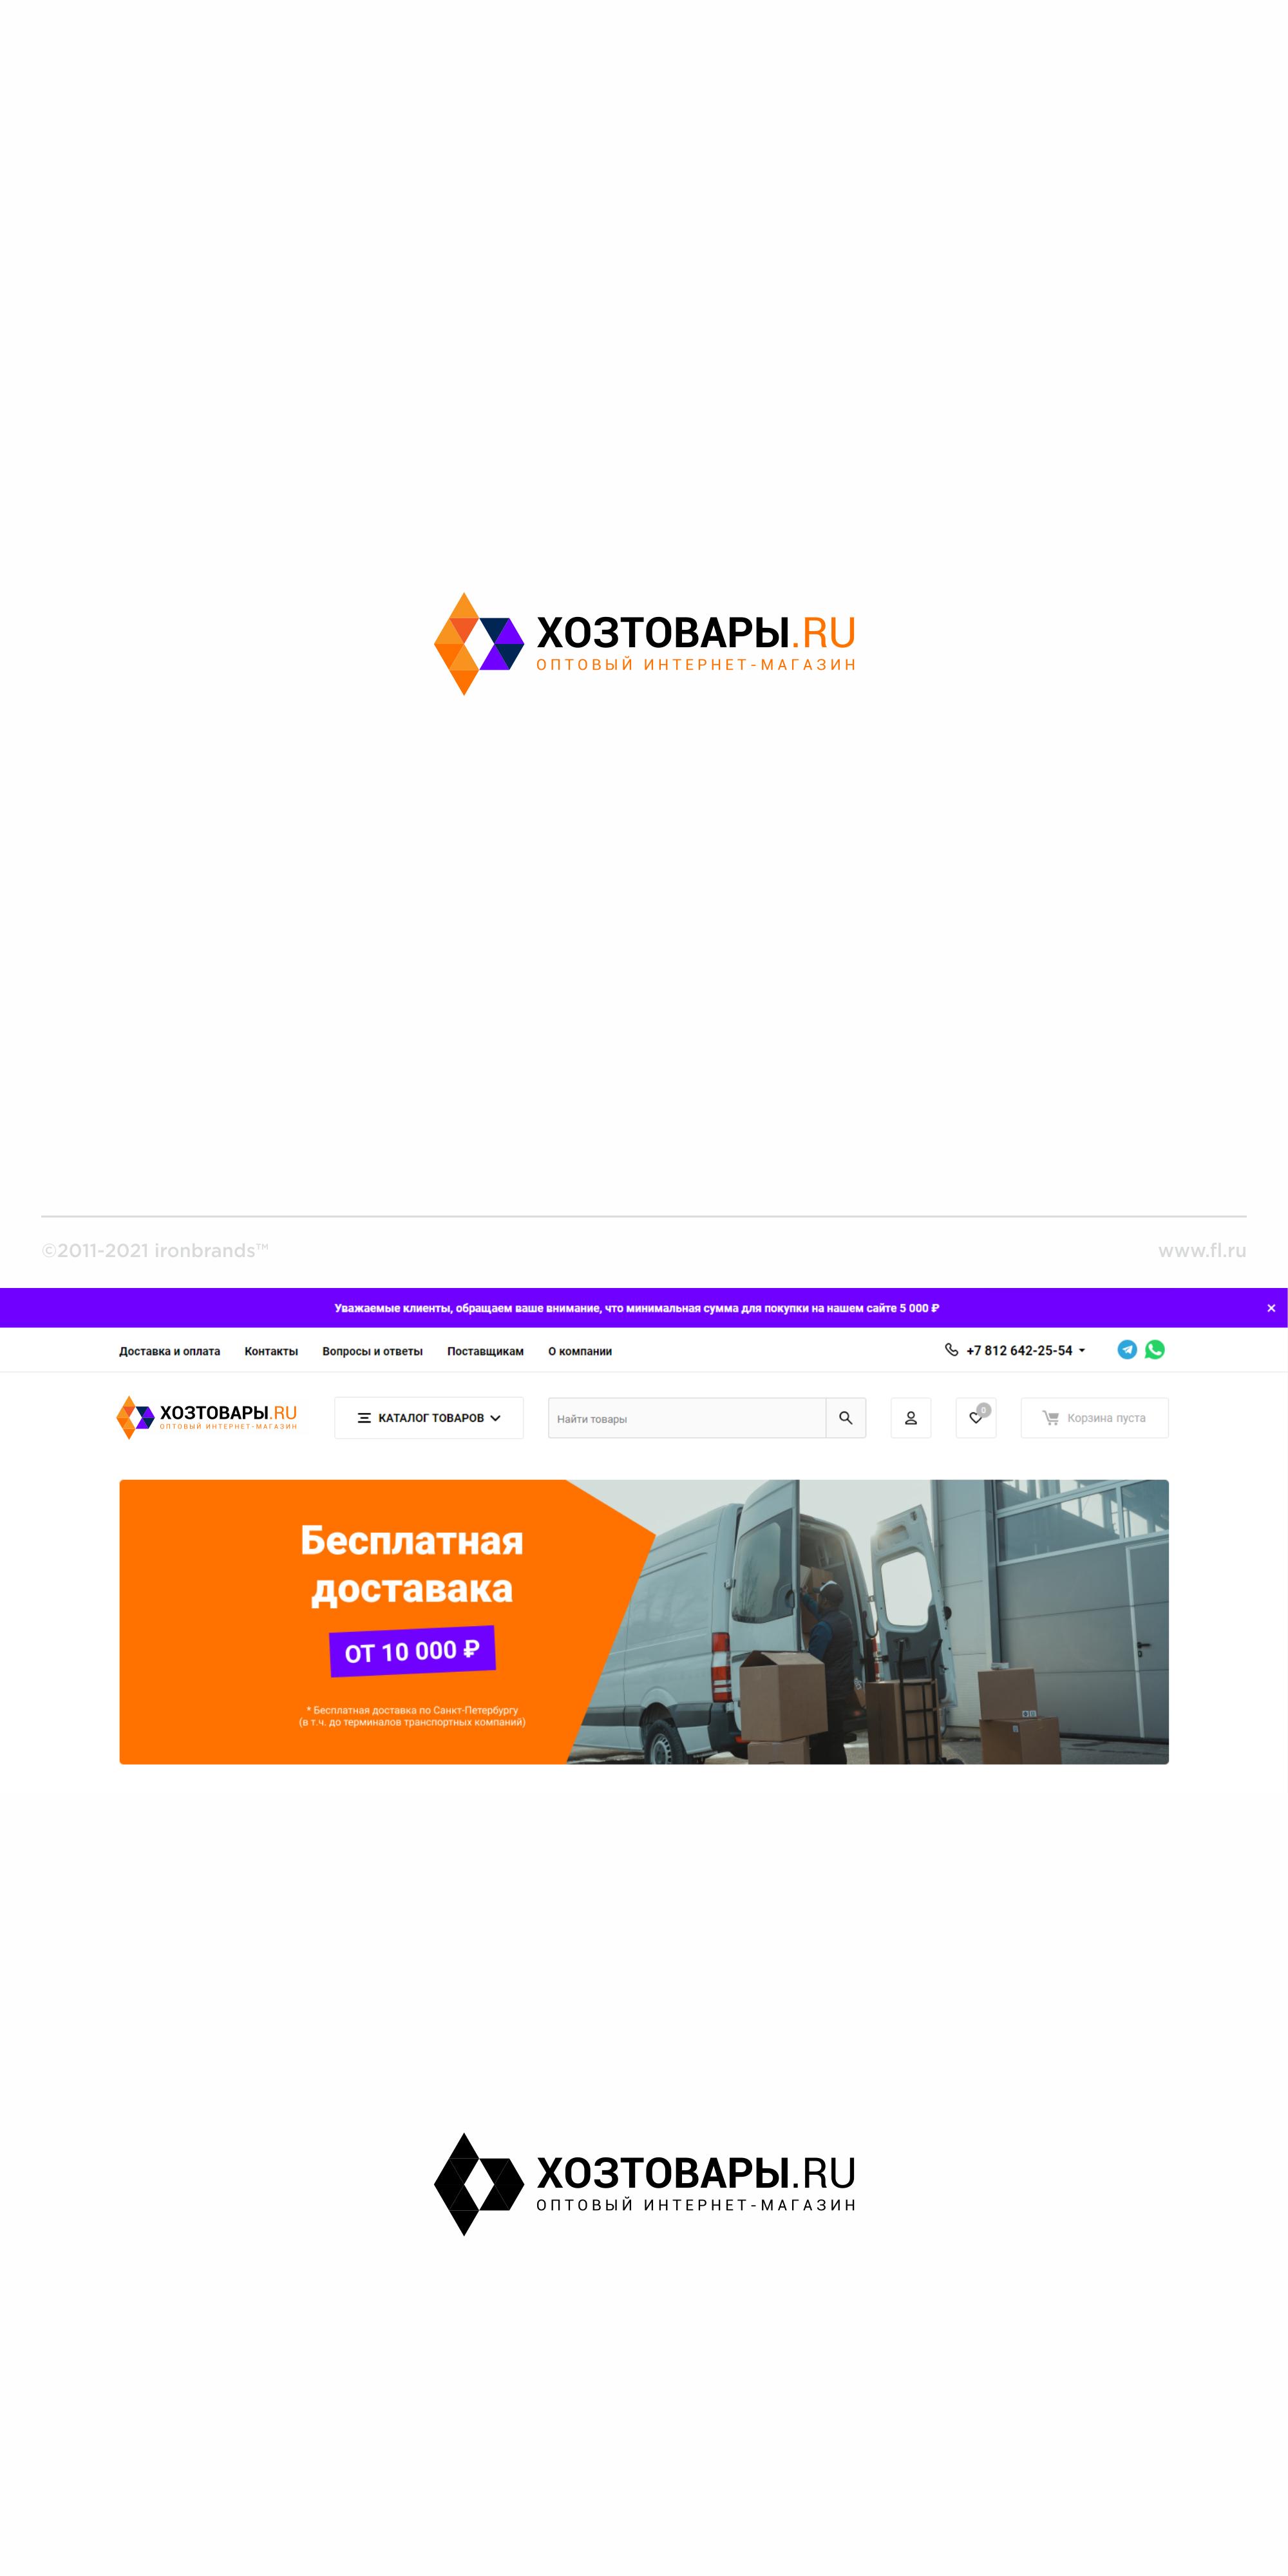 Разработка логотипа для оптового интернет-магазина «Хозтовары.ру» фото f_611607eab0aa0bb4.jpg